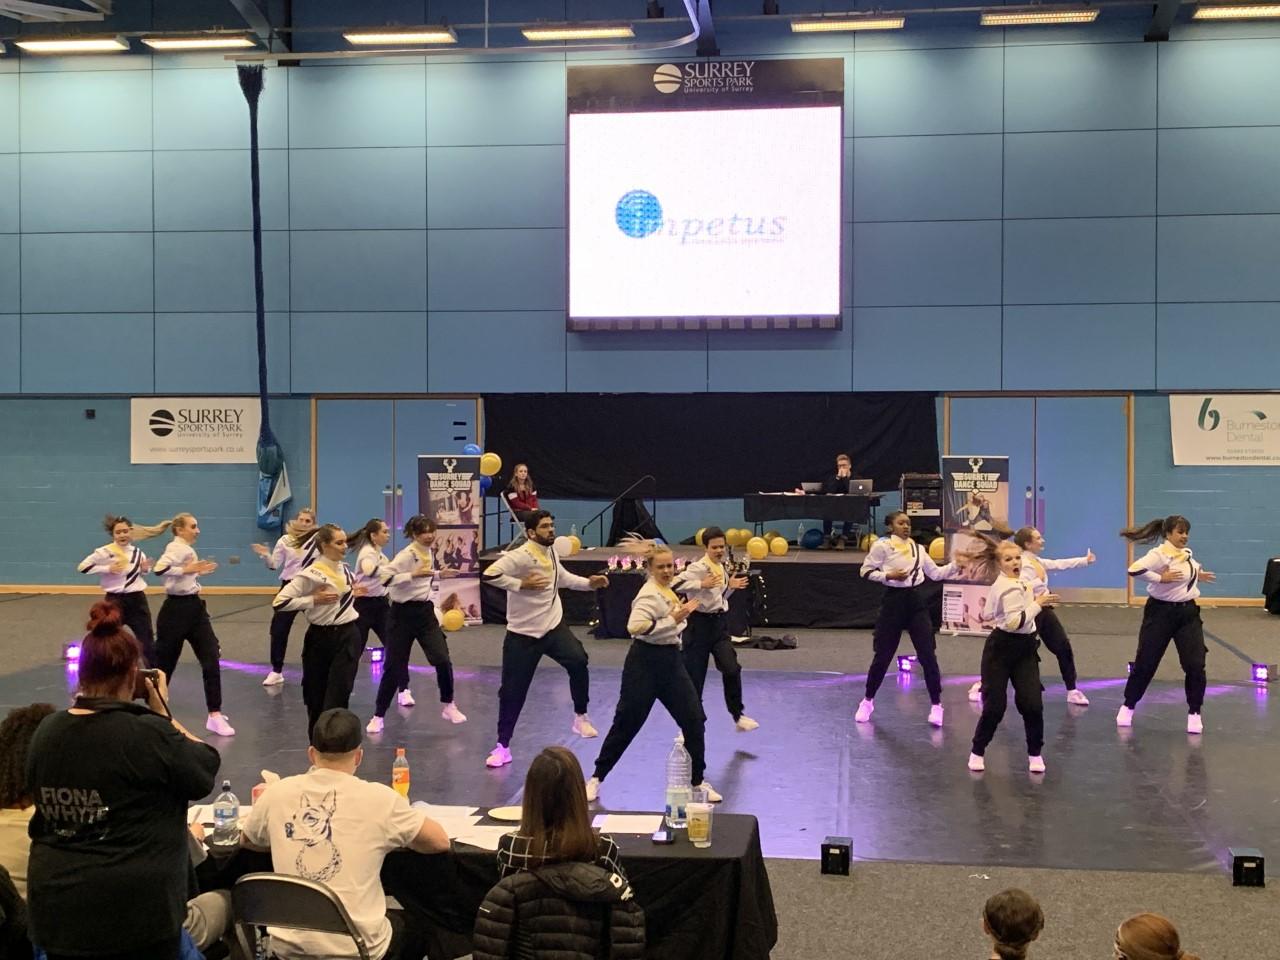 Surrey University Dance Squad